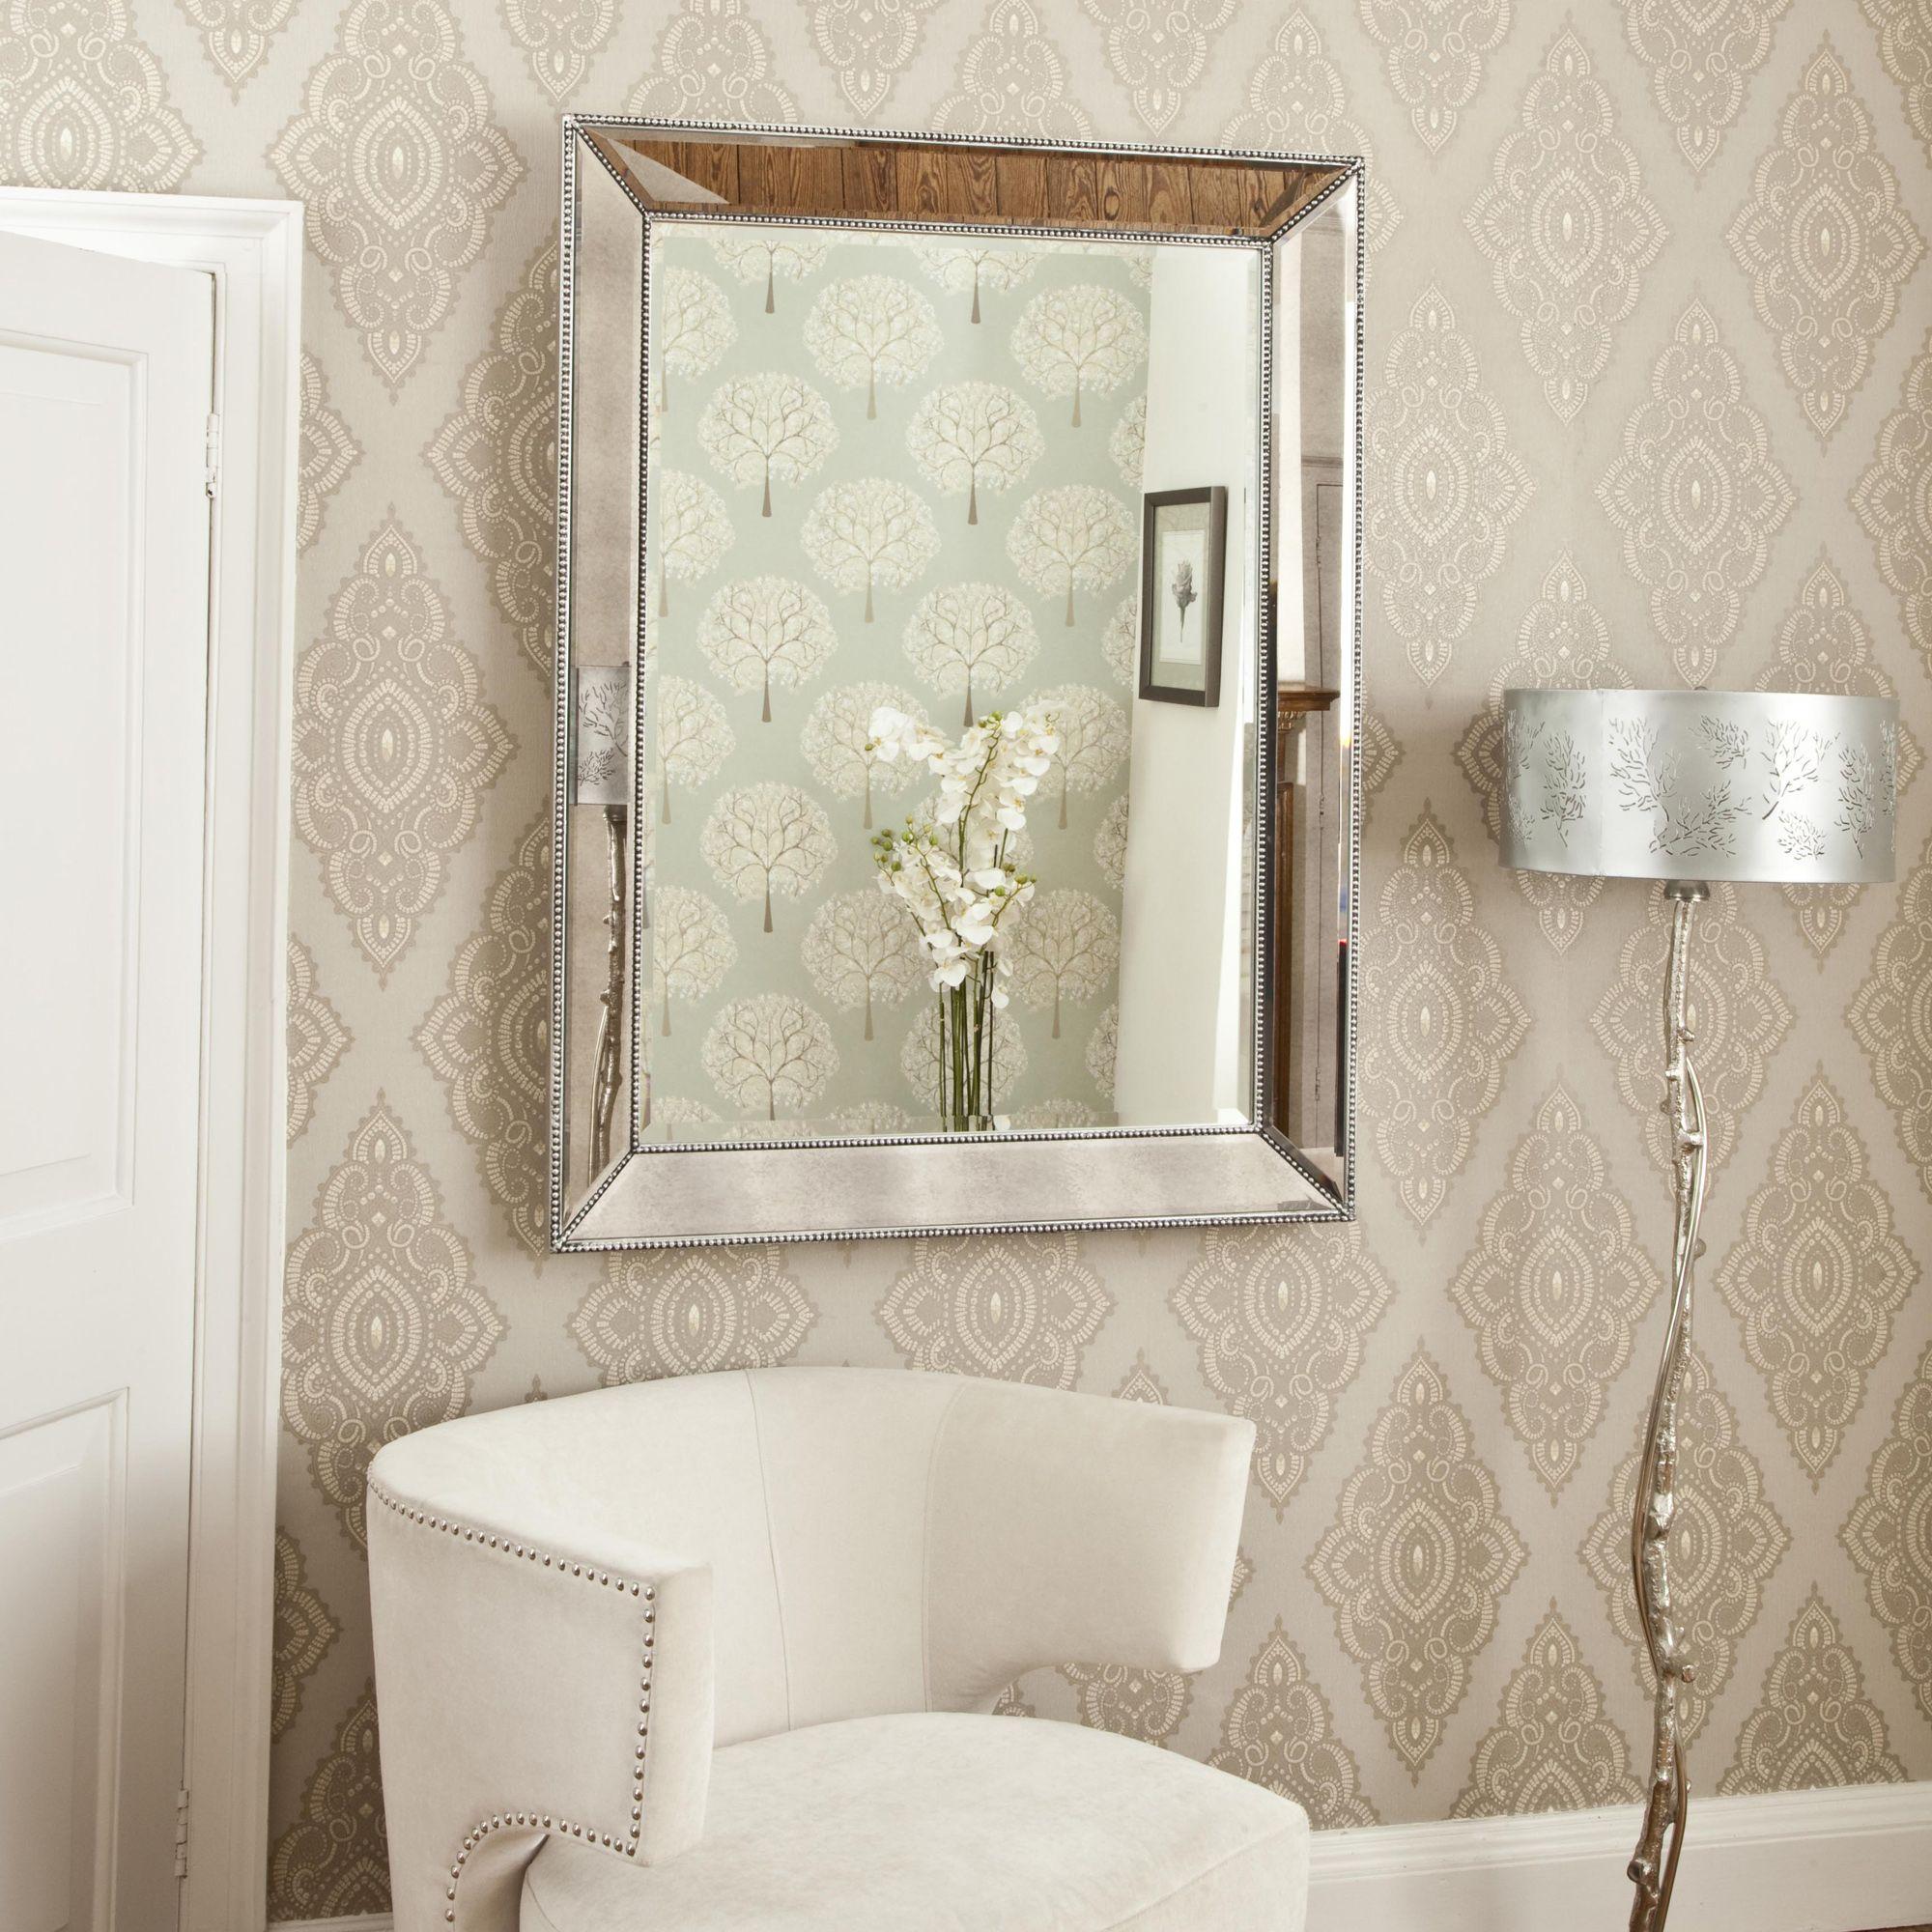 Deep Angled Silver Beaded Wall Mirror   Bathrooms   Pinterest ...